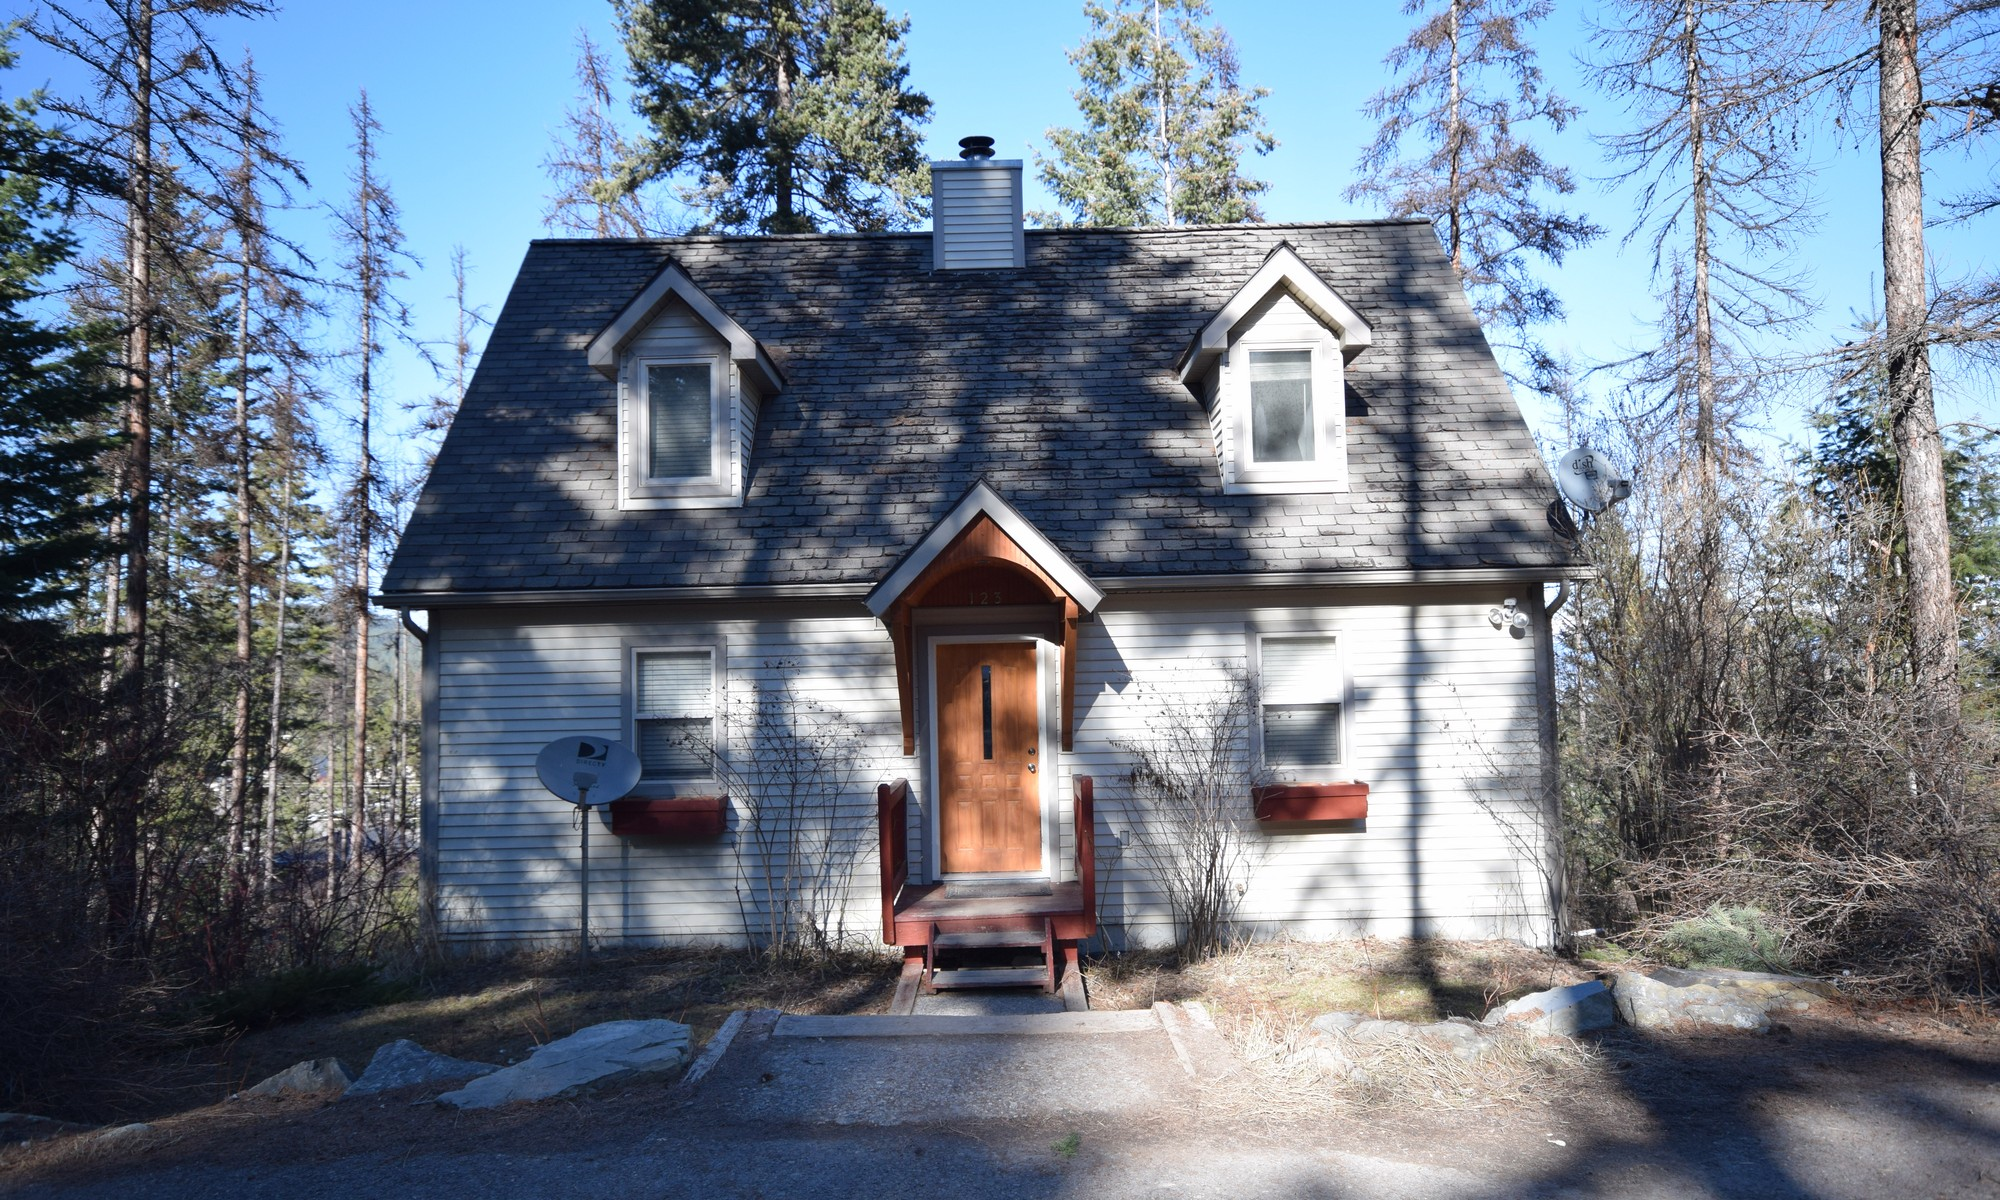 Single Family Home for Sale at Tamarack Woods 123 PARKVIEW LANE Lakeside, Montana 59922 United States